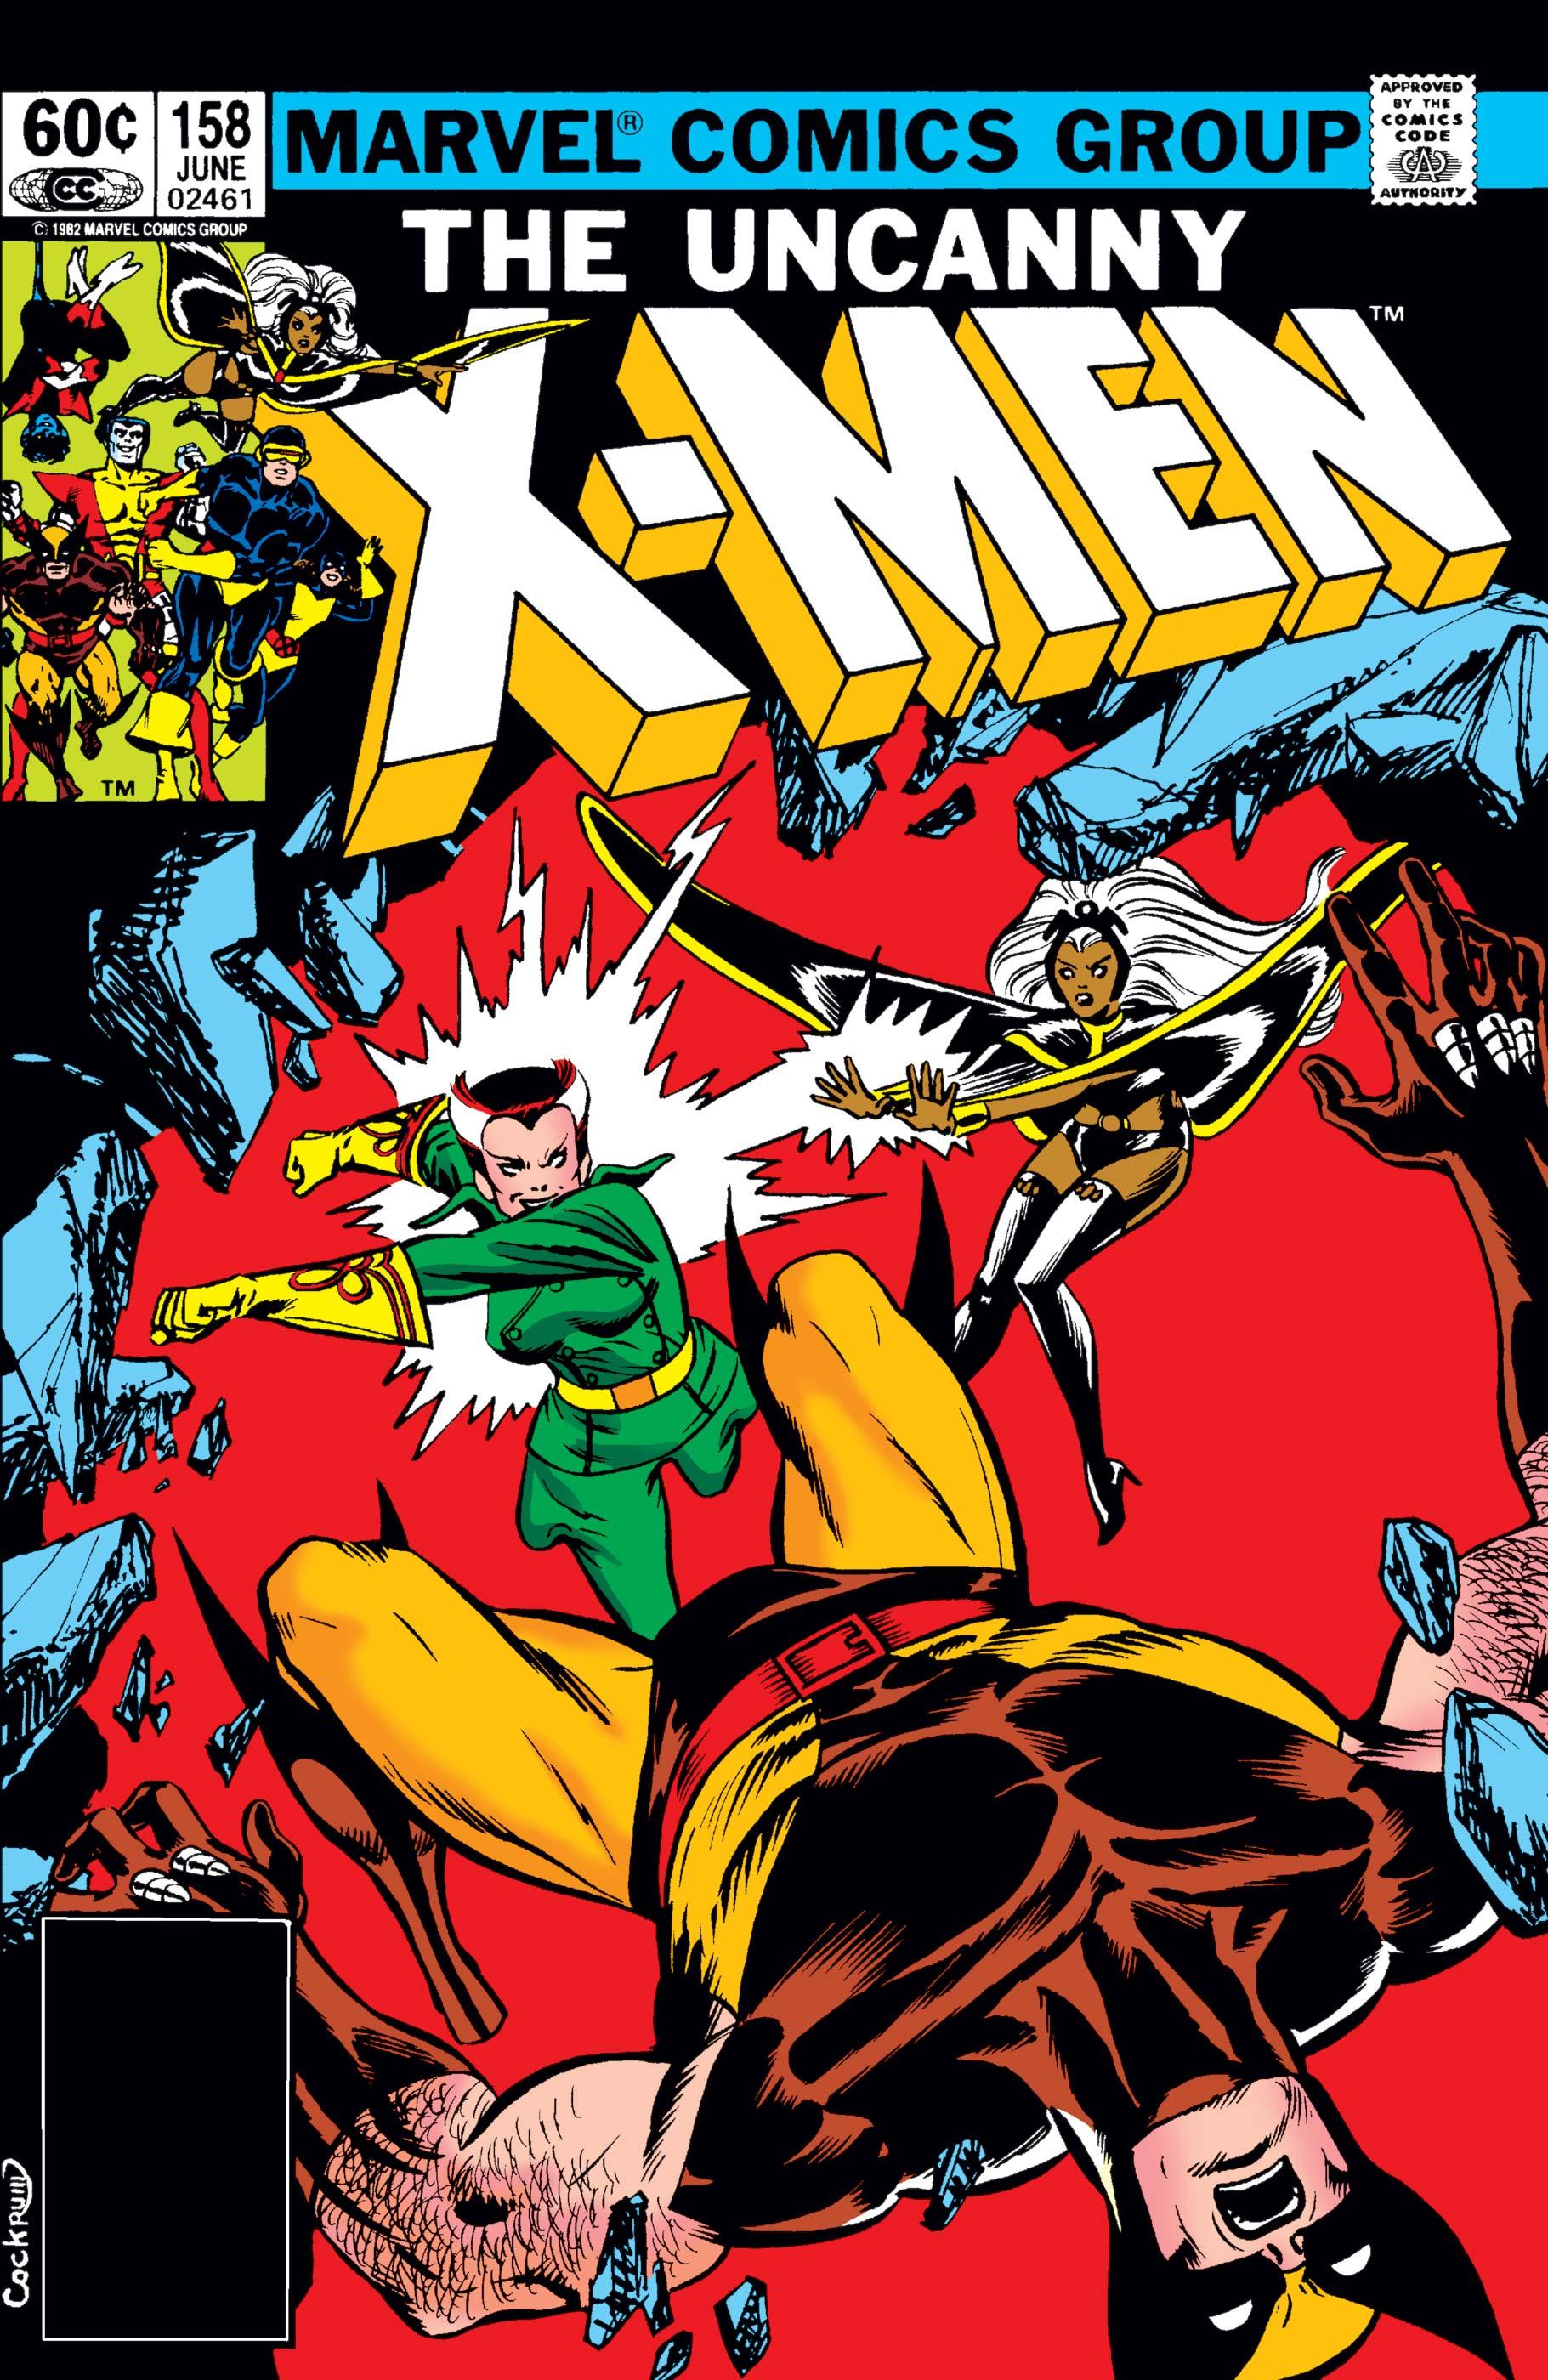 Uncanny X-Men (1963) #158